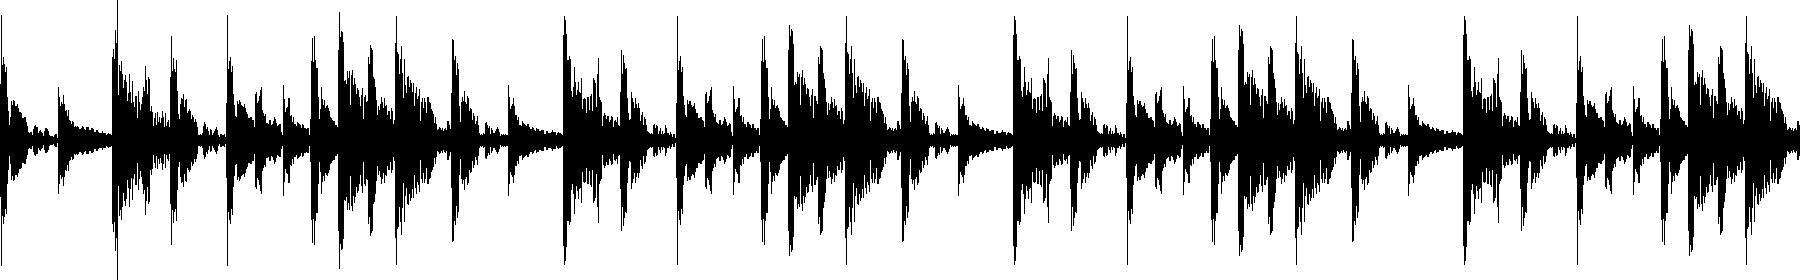 188551 drum solo 120 bpm wav